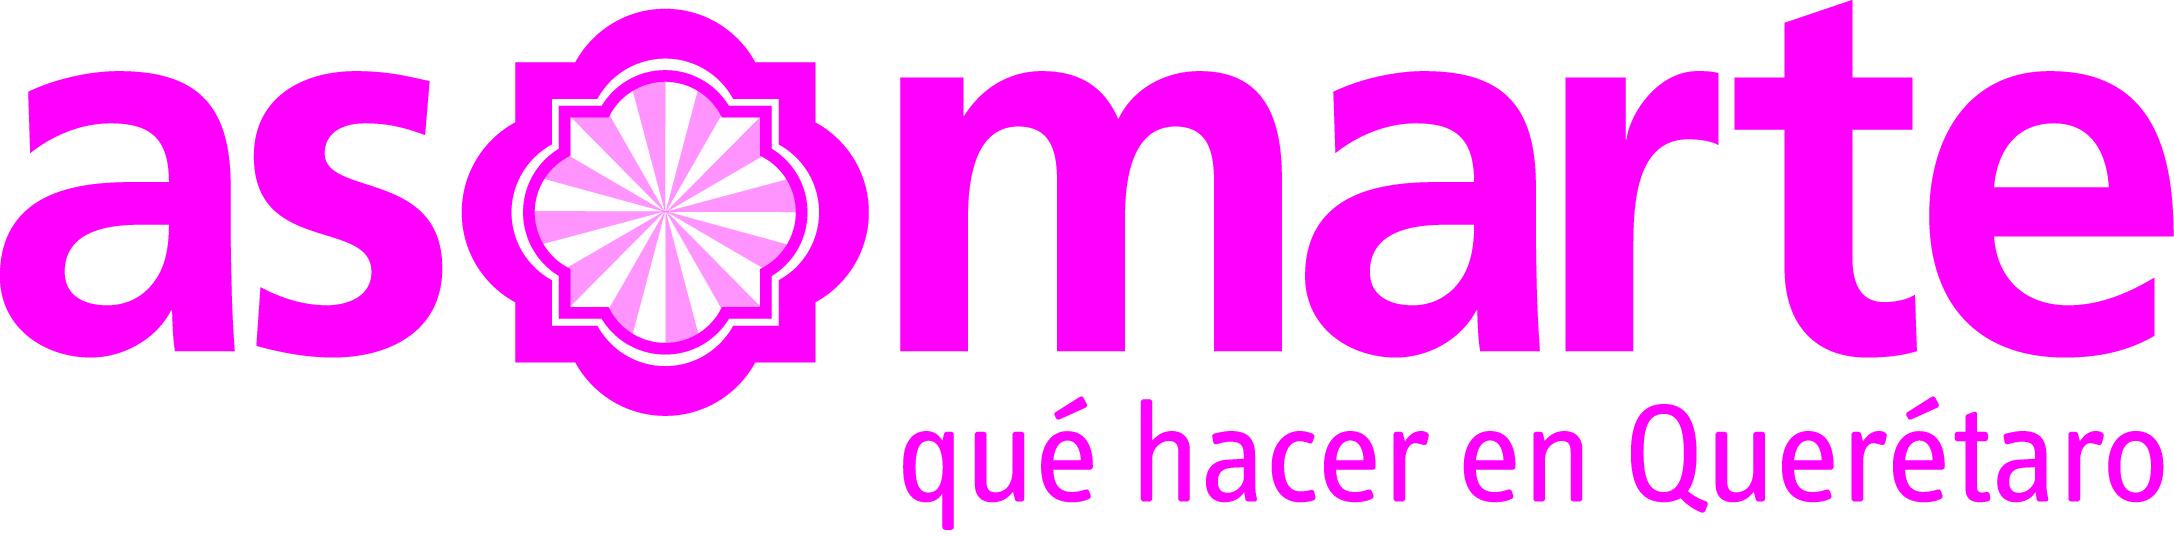 "Revista Asomarte – Edición Julio 2013 ""Turismo Accesible"""